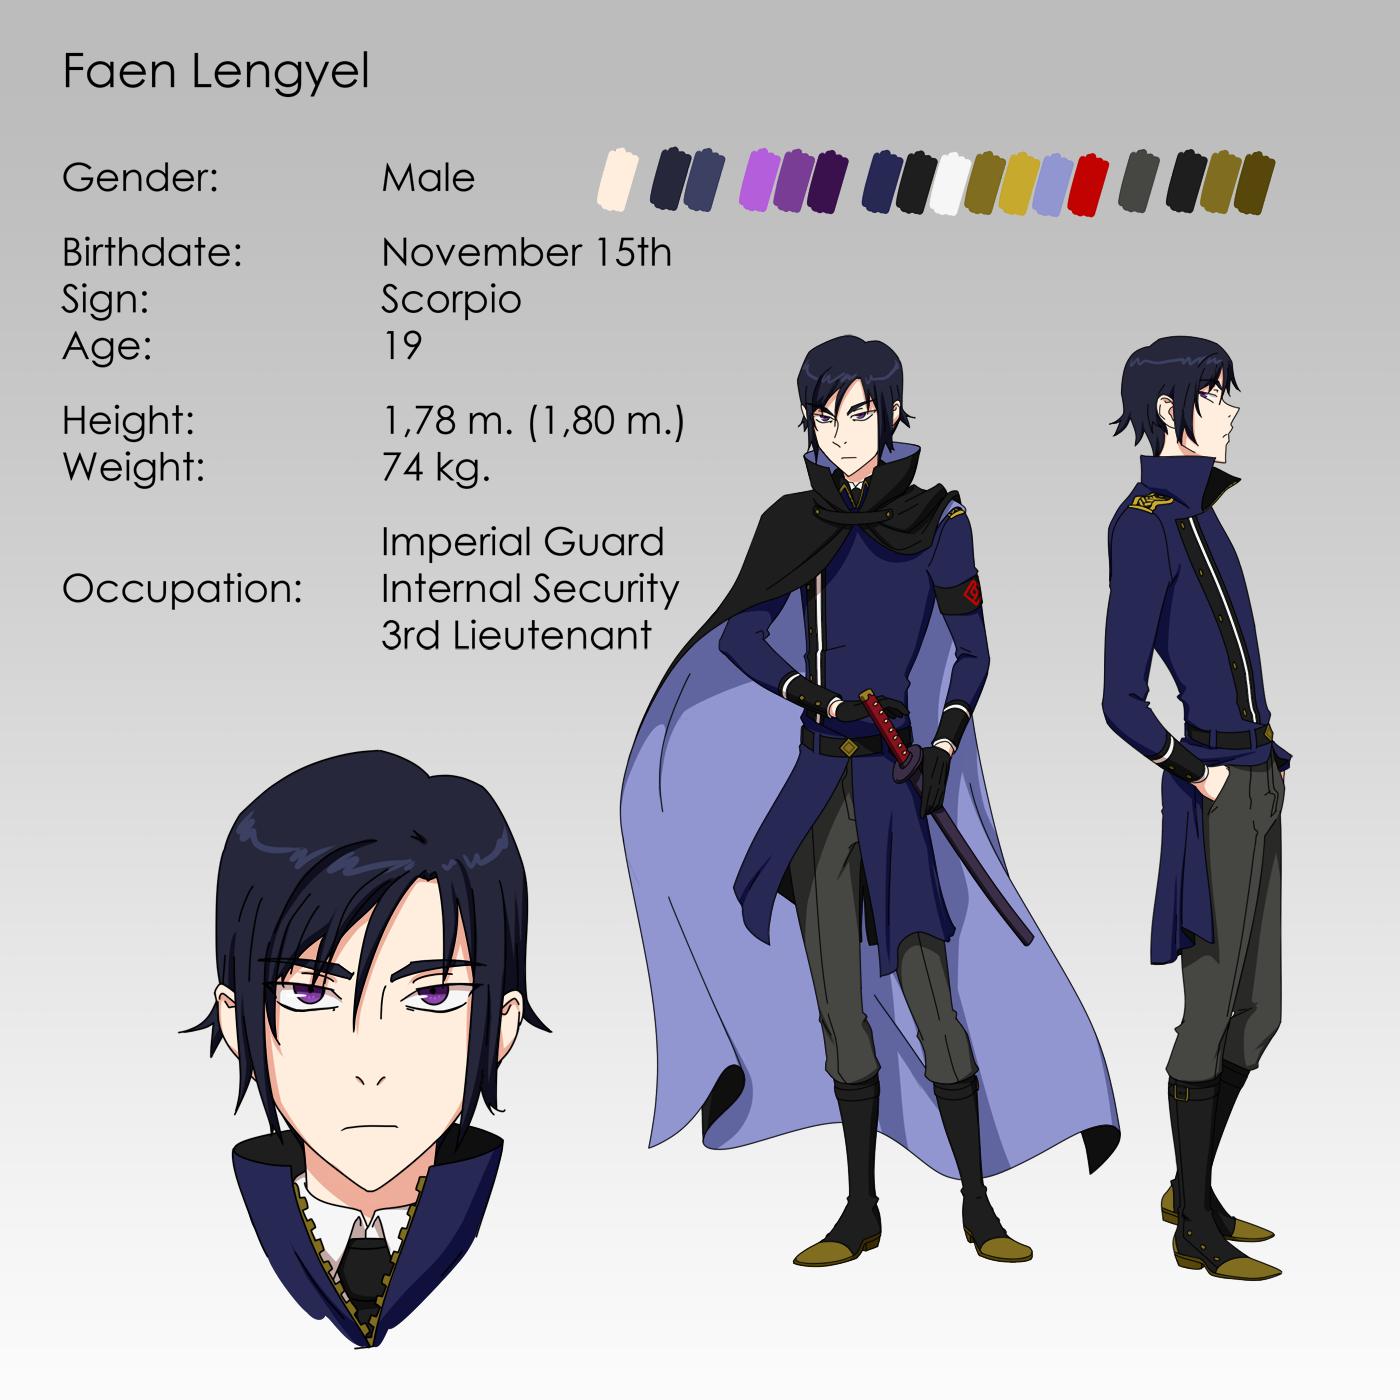 Faen character sheet by Flipfloppery